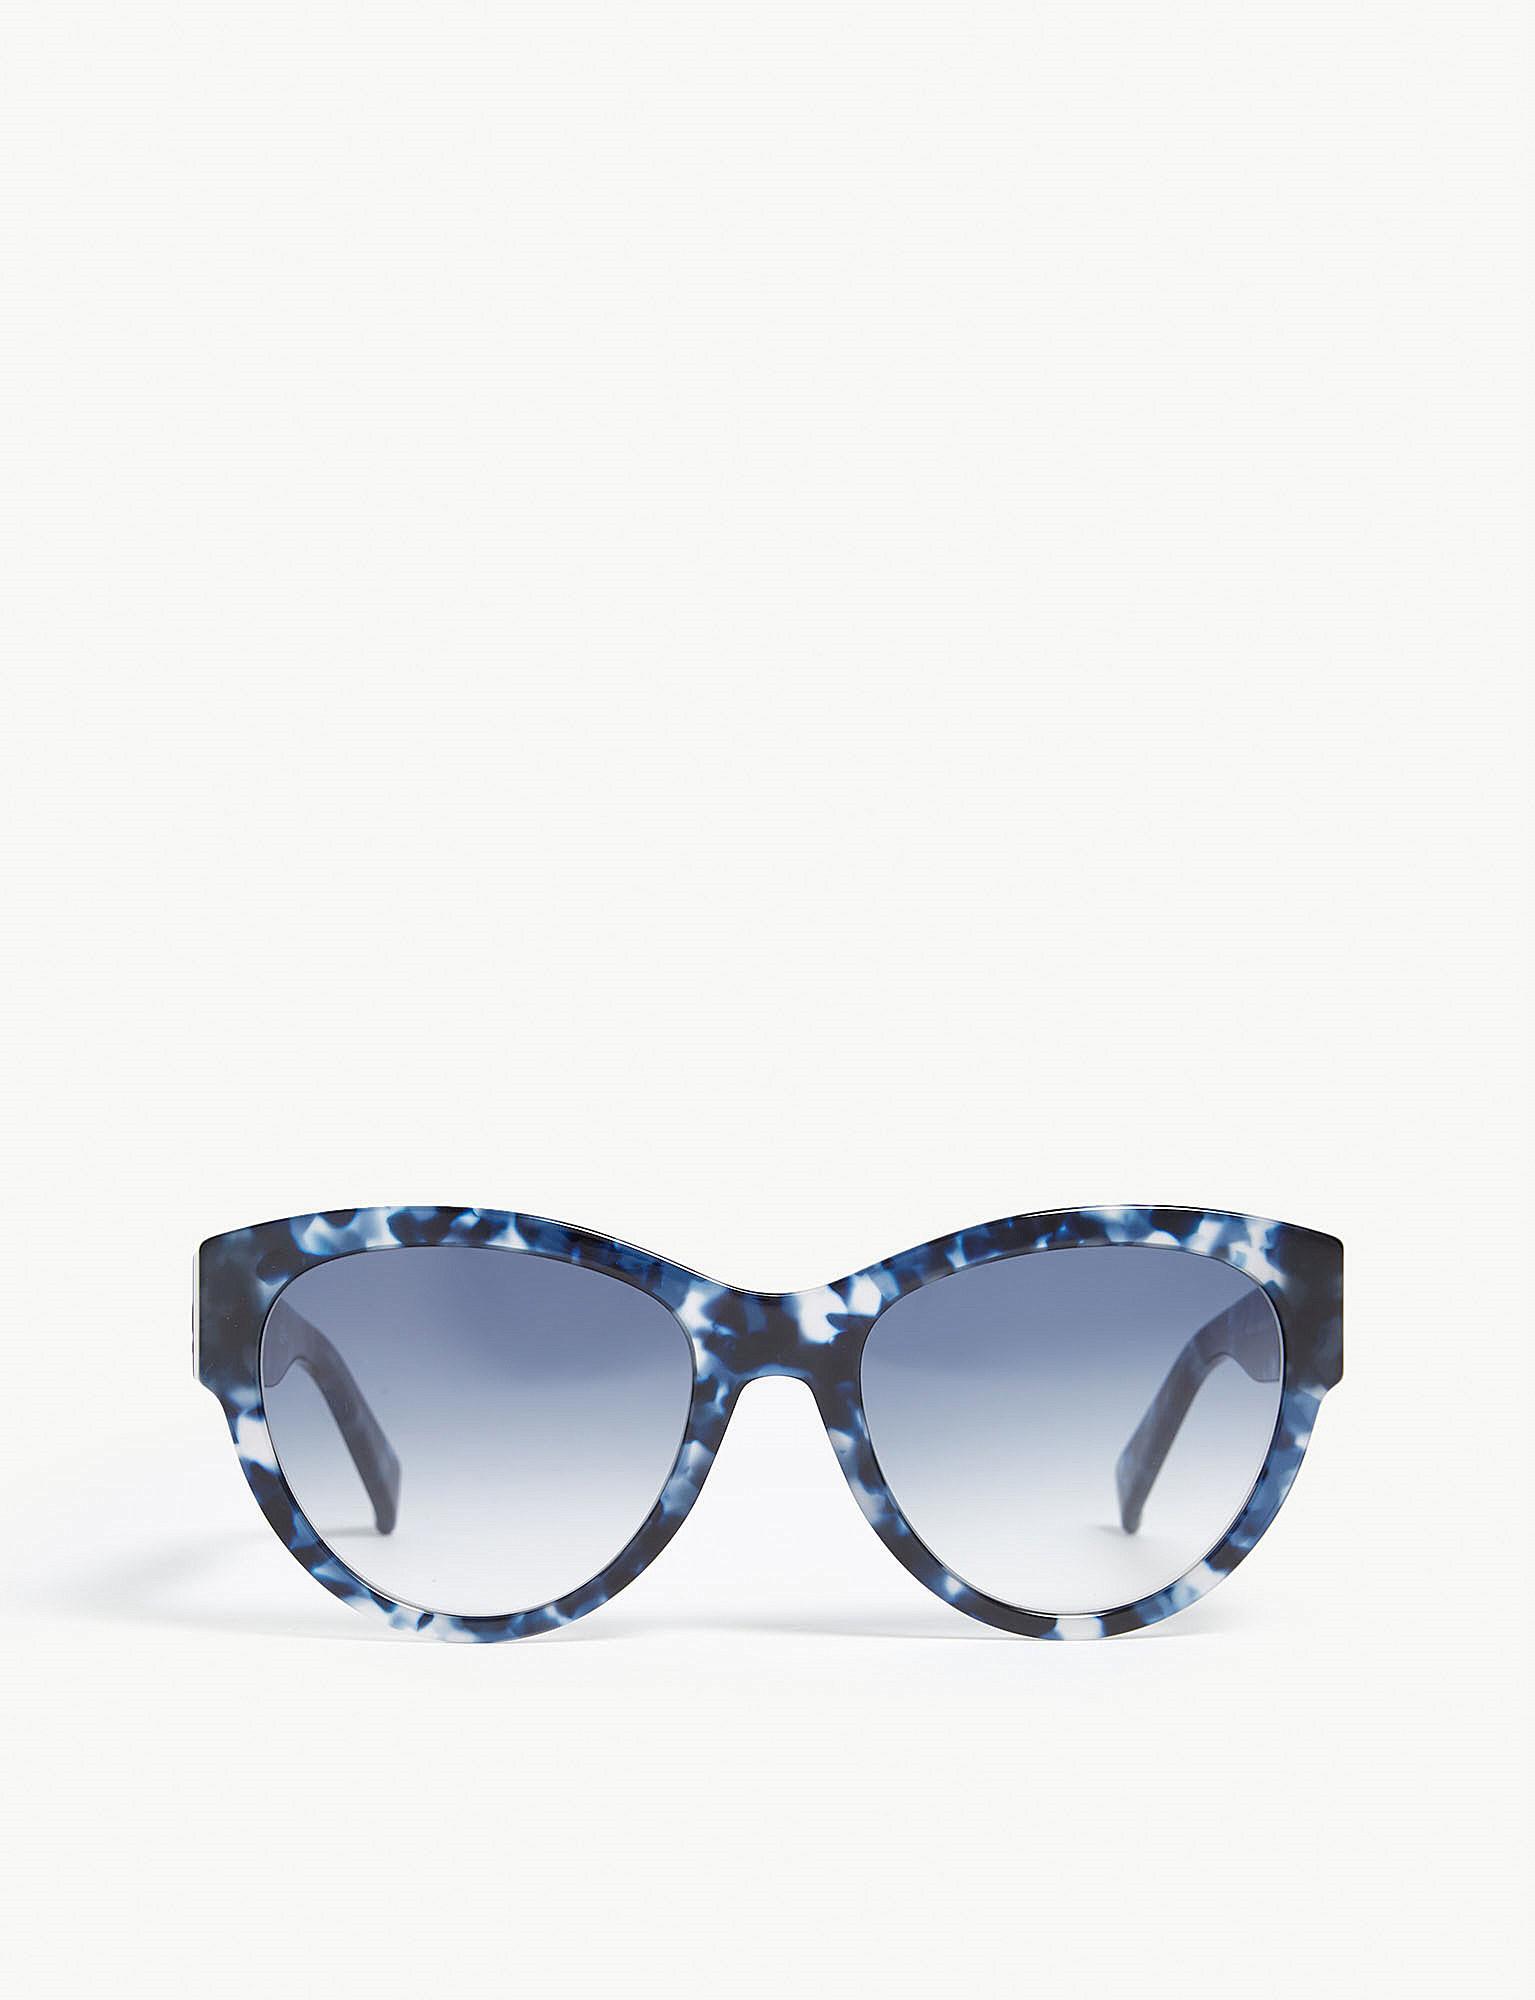 fa98305b74c0 Max Mara Flat3 Cat Eye-frame Sunglasses in Blue - Lyst